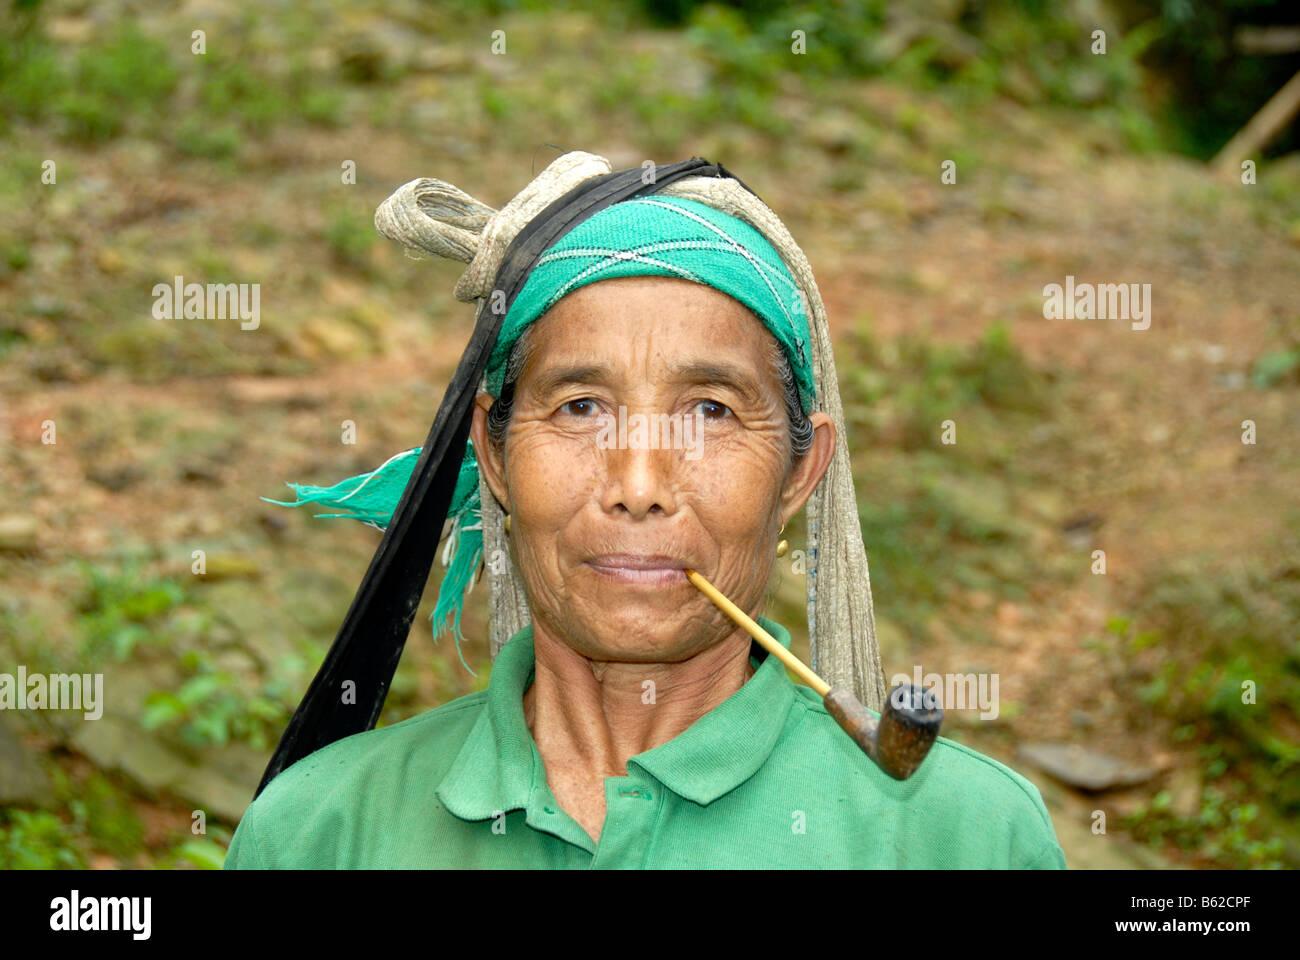 Porträt einer Frau des Stammes Lao Seng raucht eine Pfeife im Dorf Ban Tang, Provinz Phongsali, Laos, Südostasien Stockbild